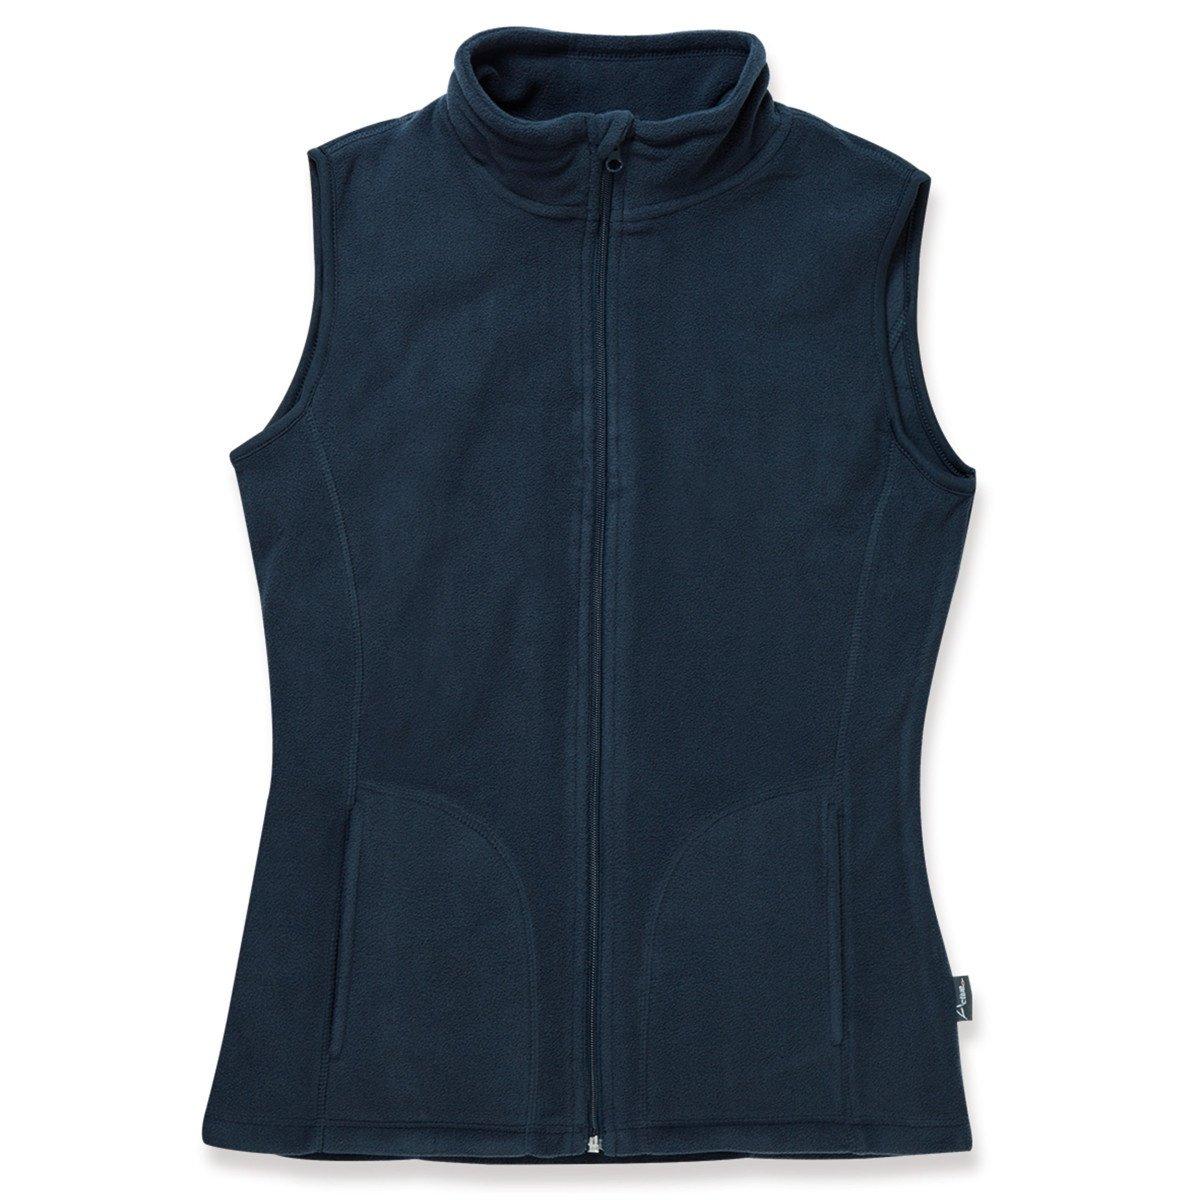 Active By Stedman Womens Fleece Vest